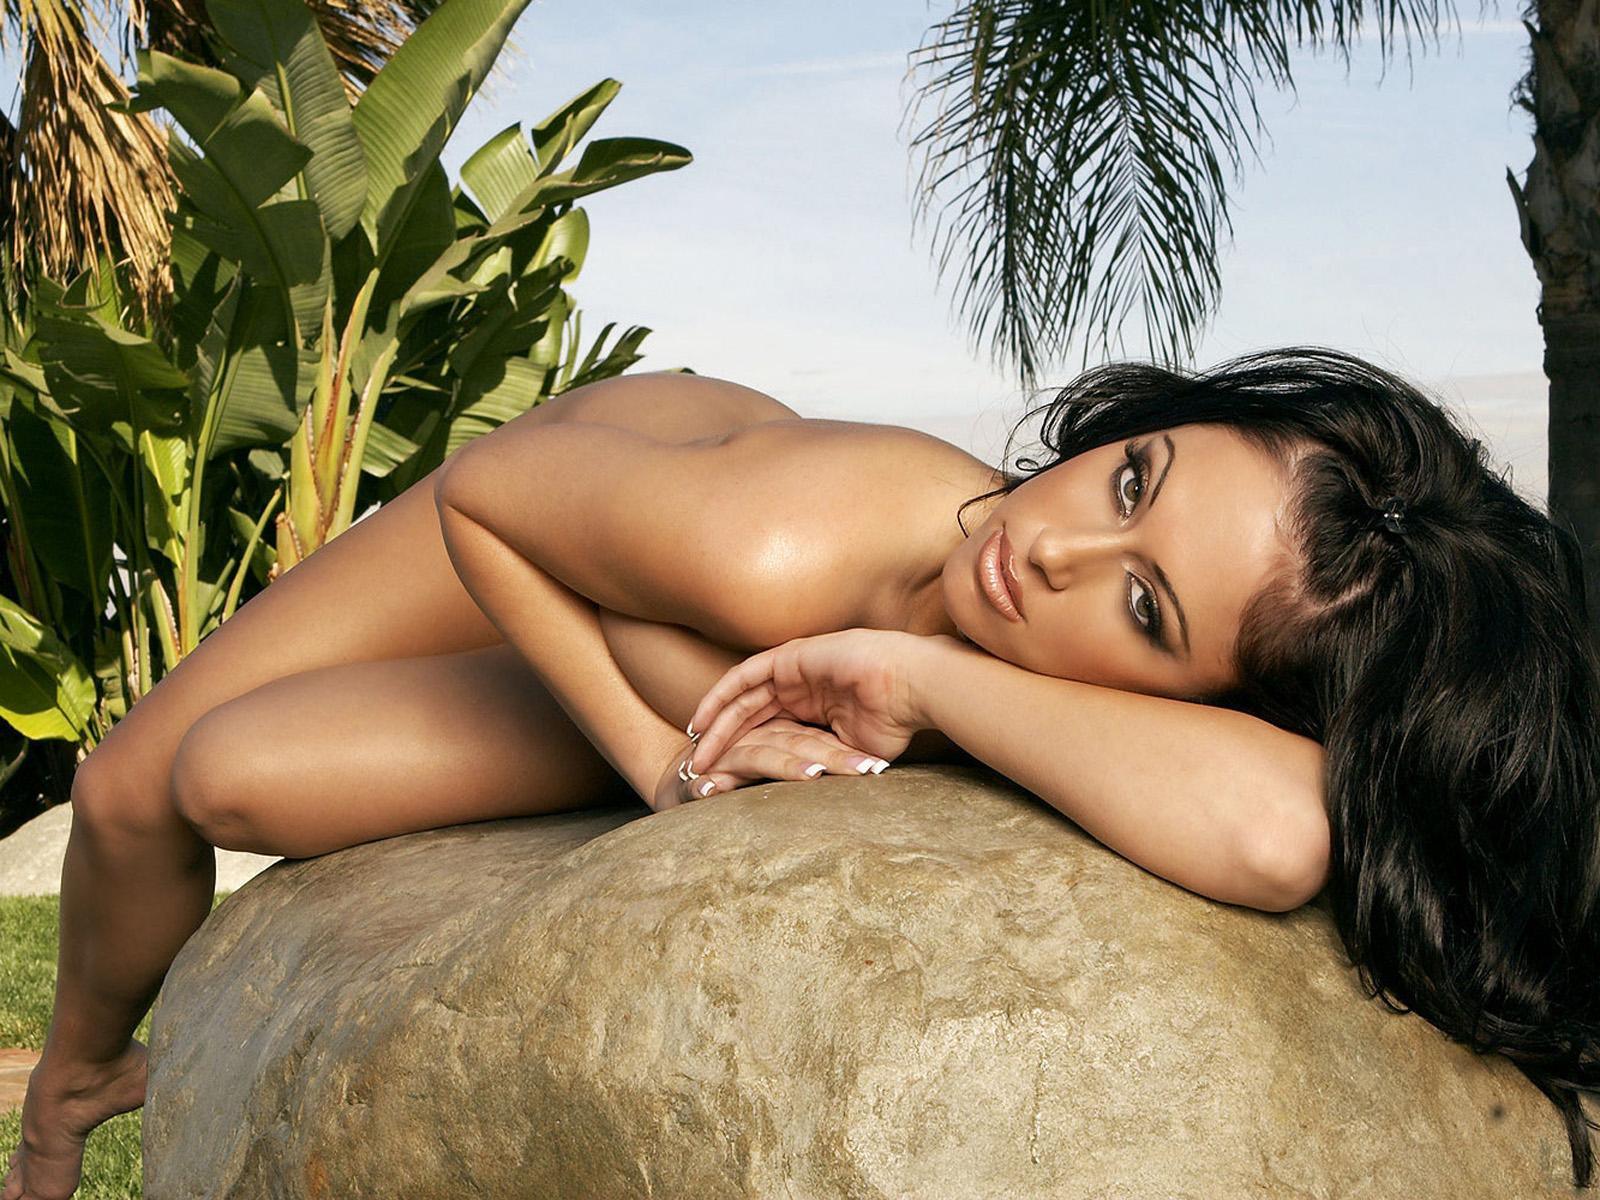 Best Hd Wallpapers Collection Nude, Semi Nude, Bikini And -4064